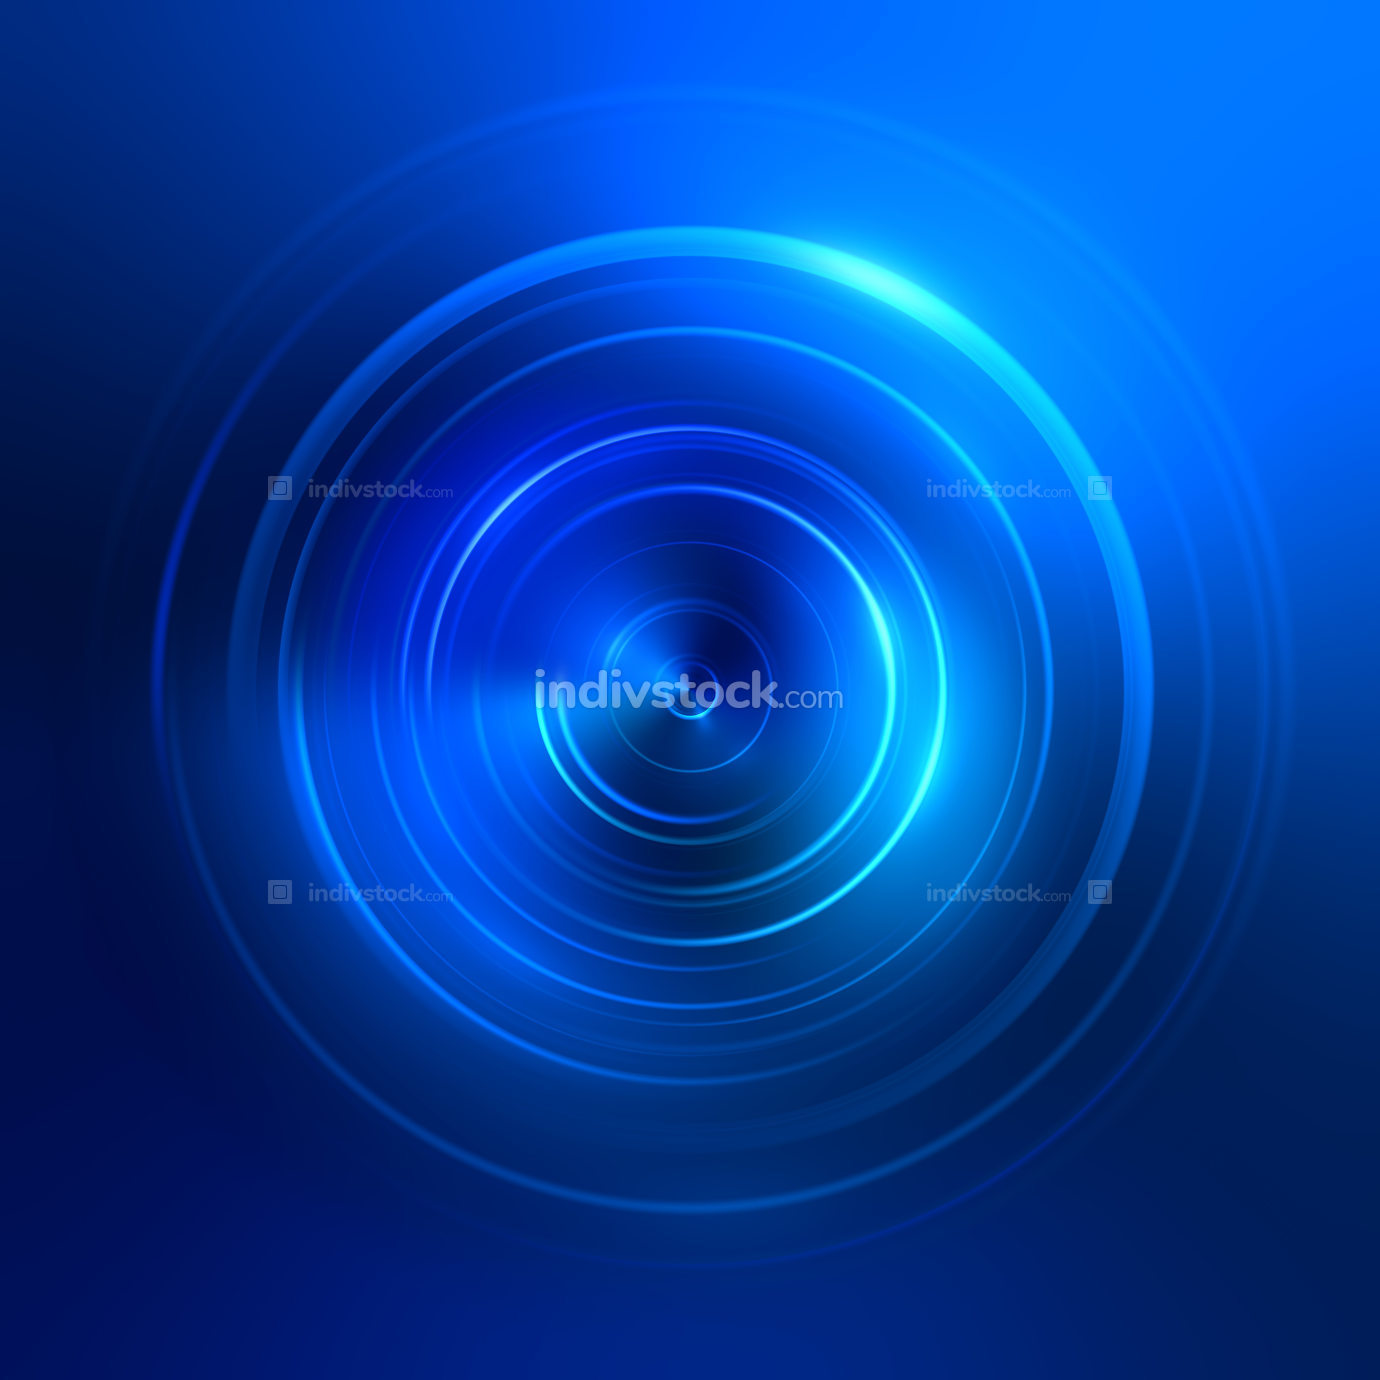 2d illustration blue light circles background